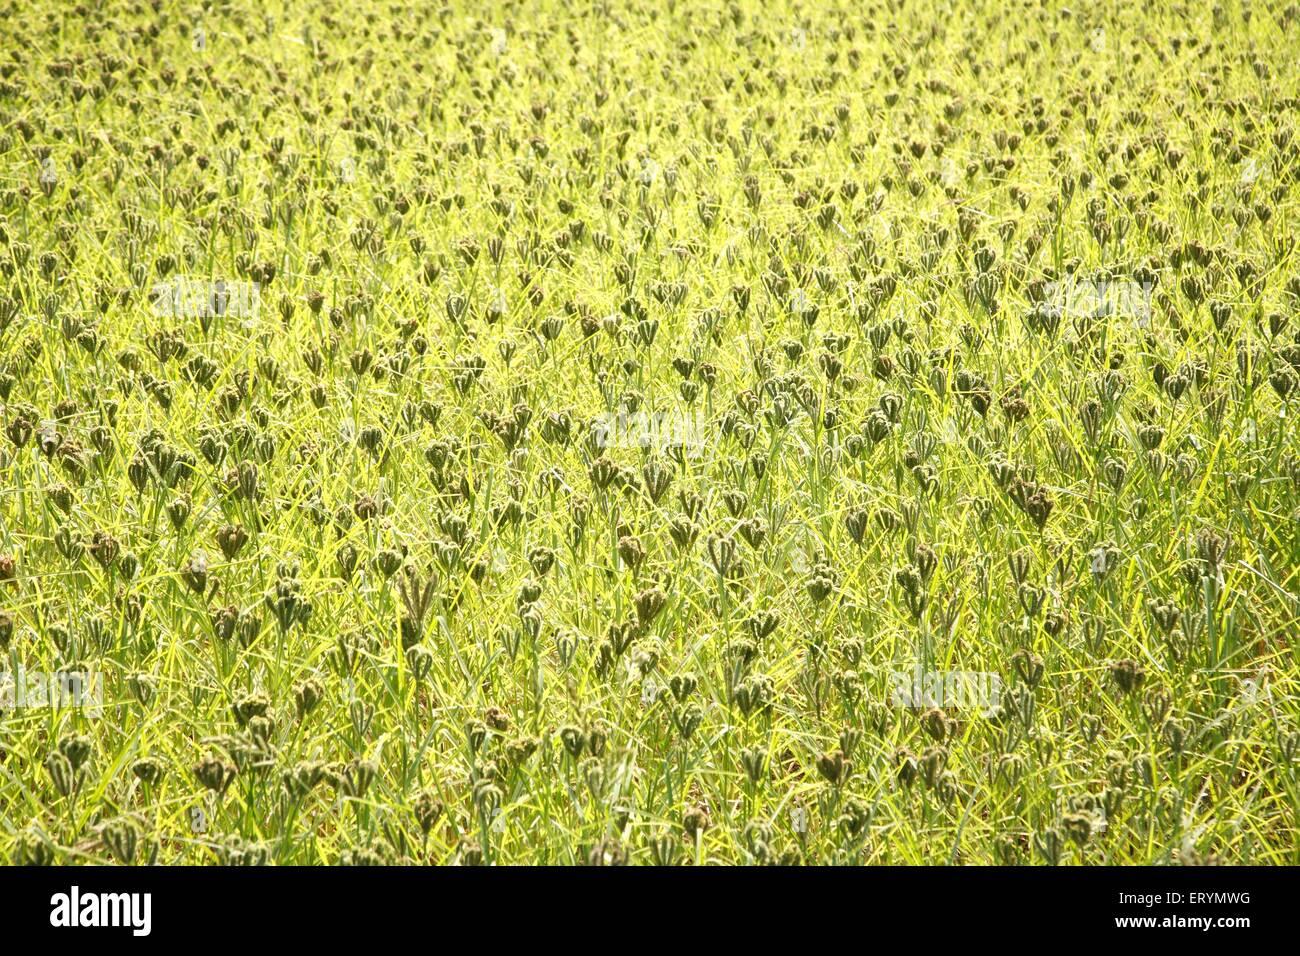 Nachni Ragi le petit mil Eleusine coracana cultures au champ; Sawantwadi;;; Inde Maharashtra Photo Stock